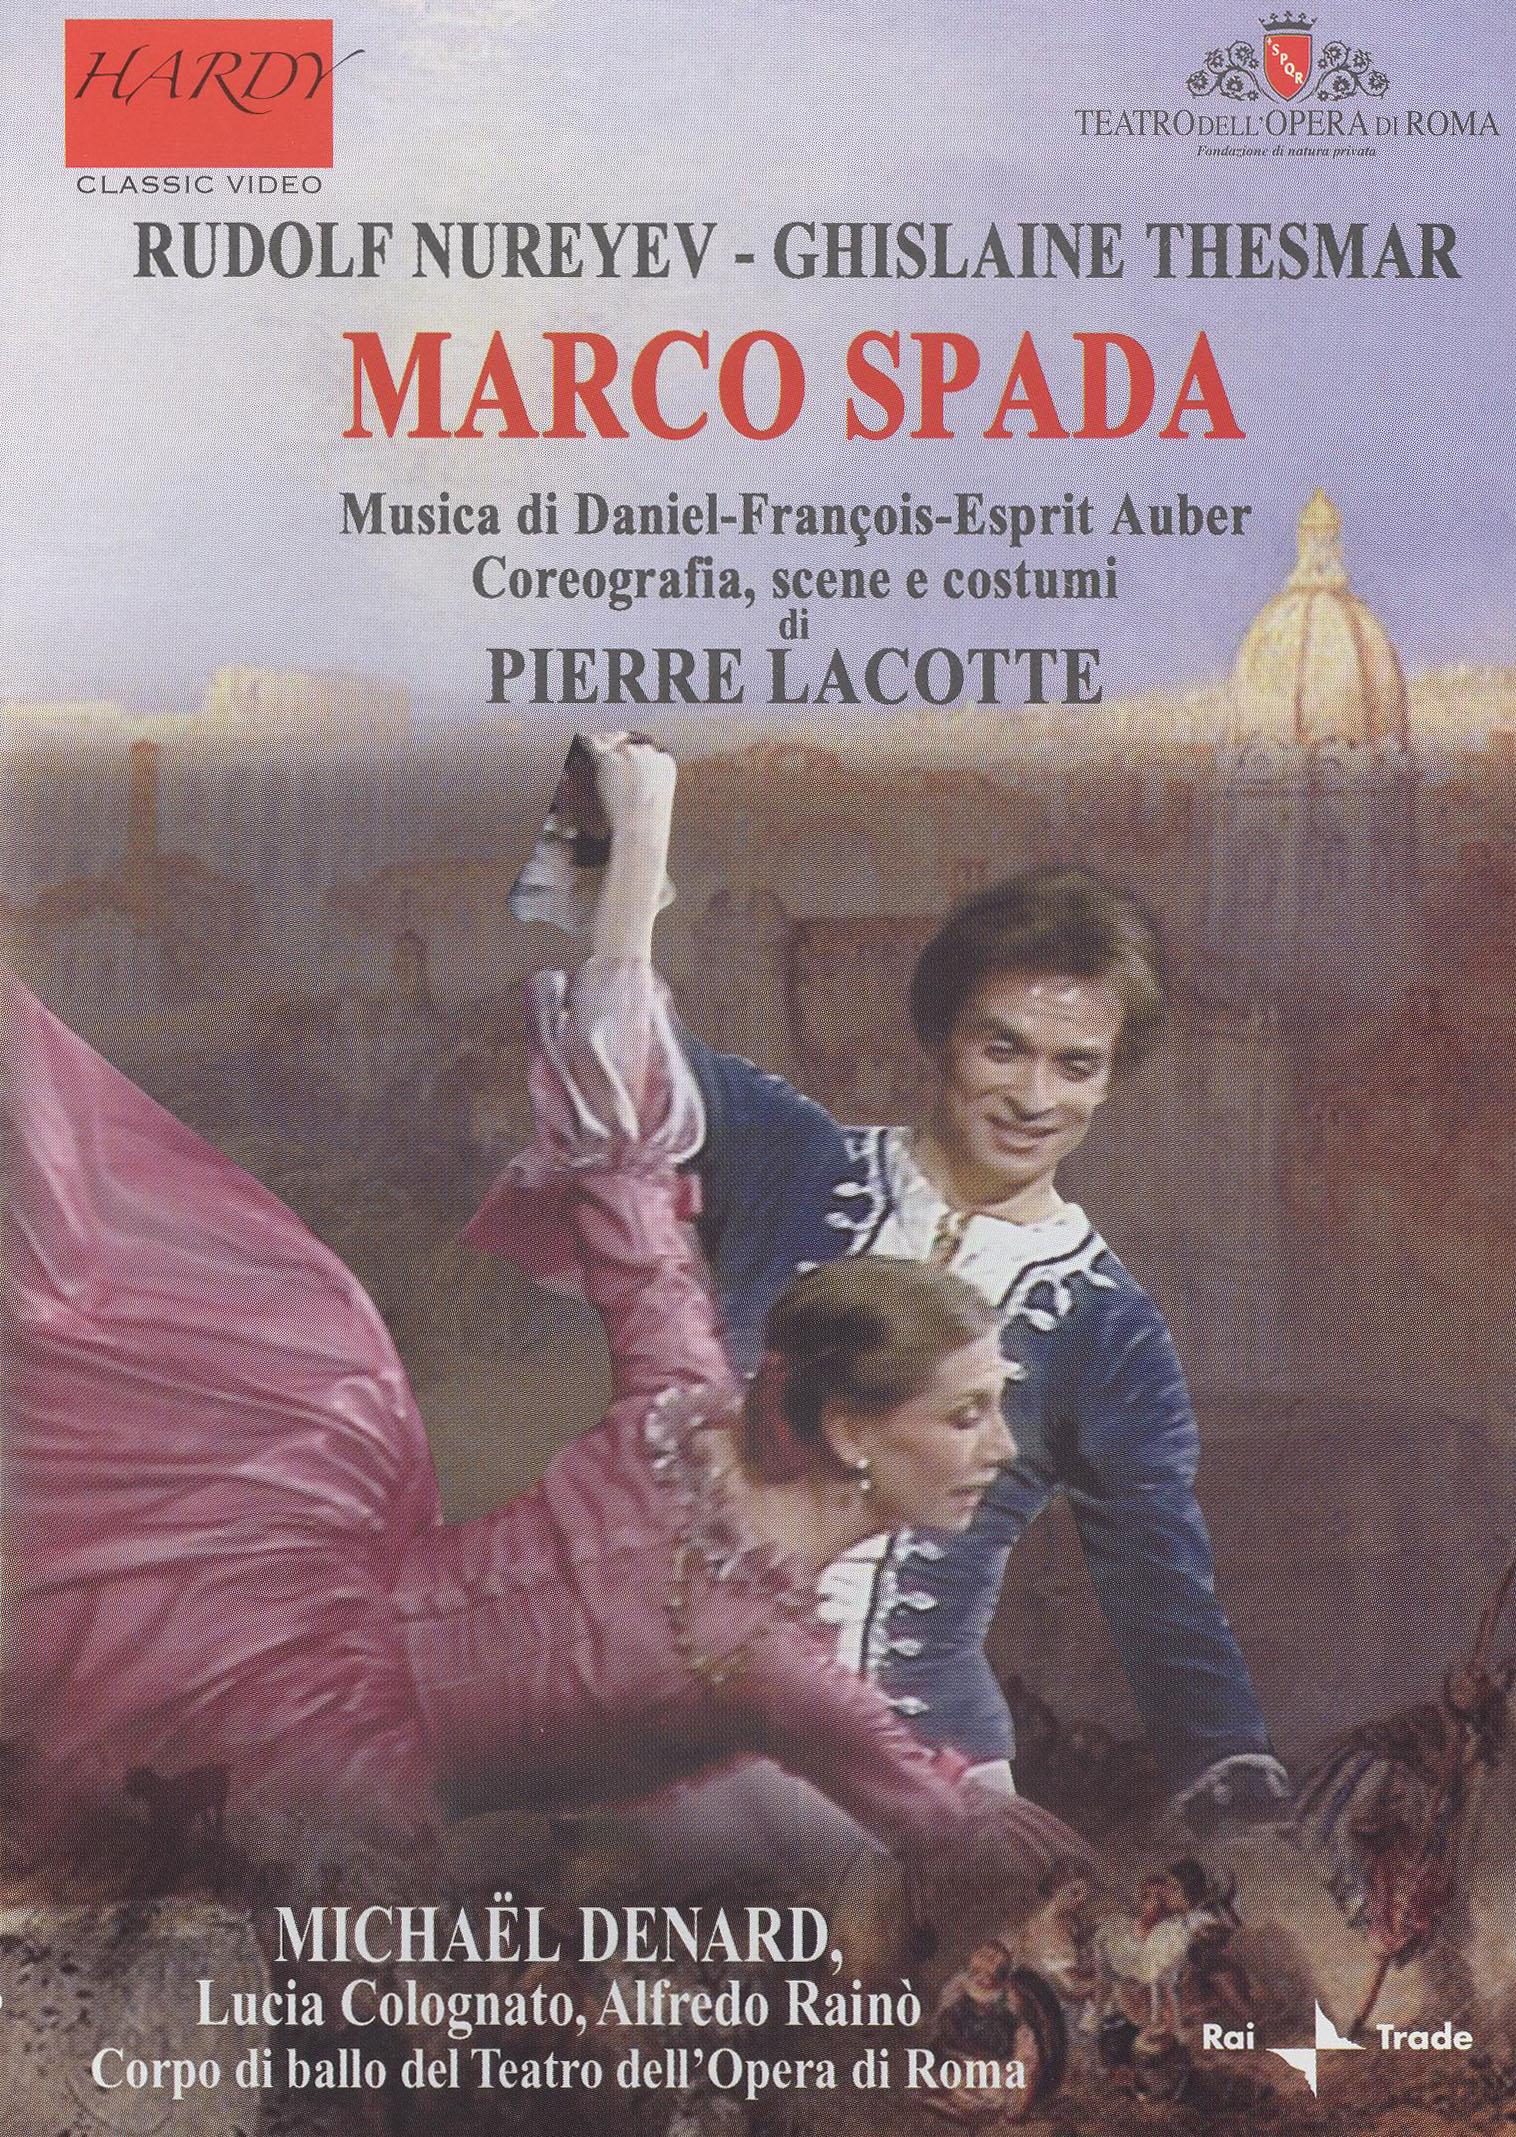 Marco Spada (Rome Opera Ballet)